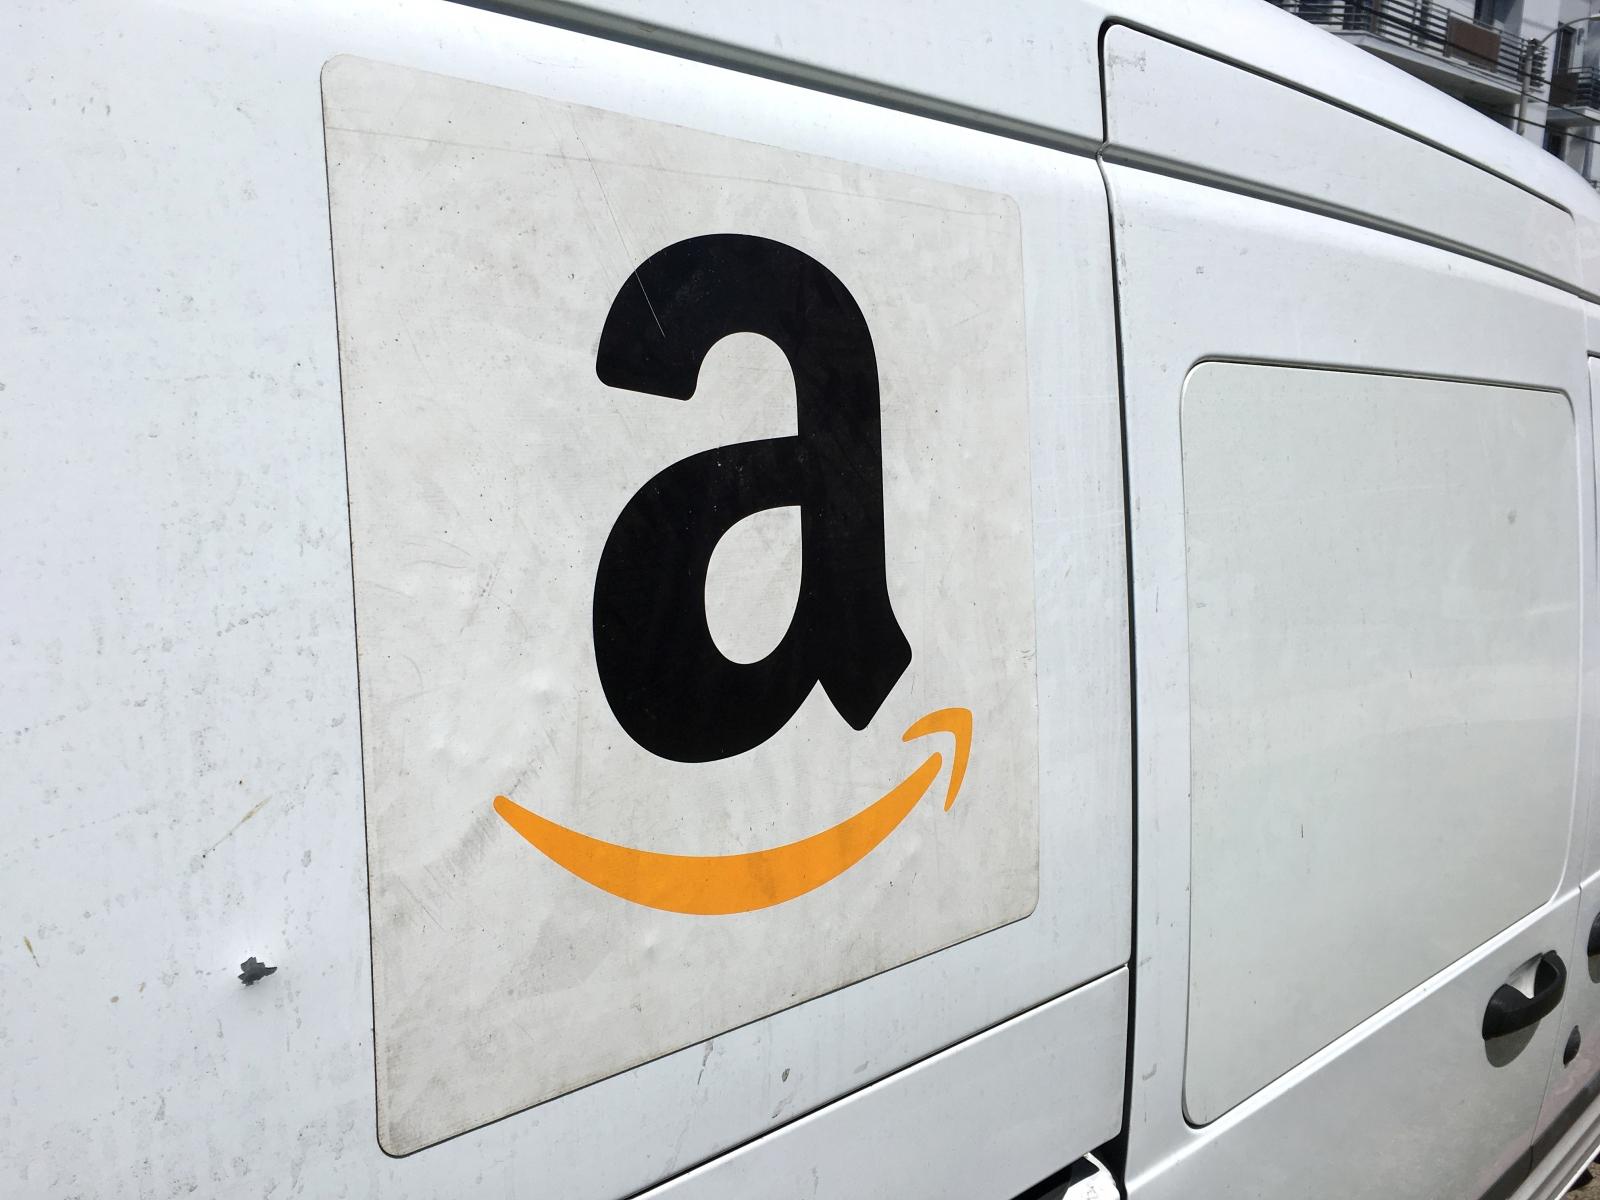 Amazon error sends dog photo to shoppers